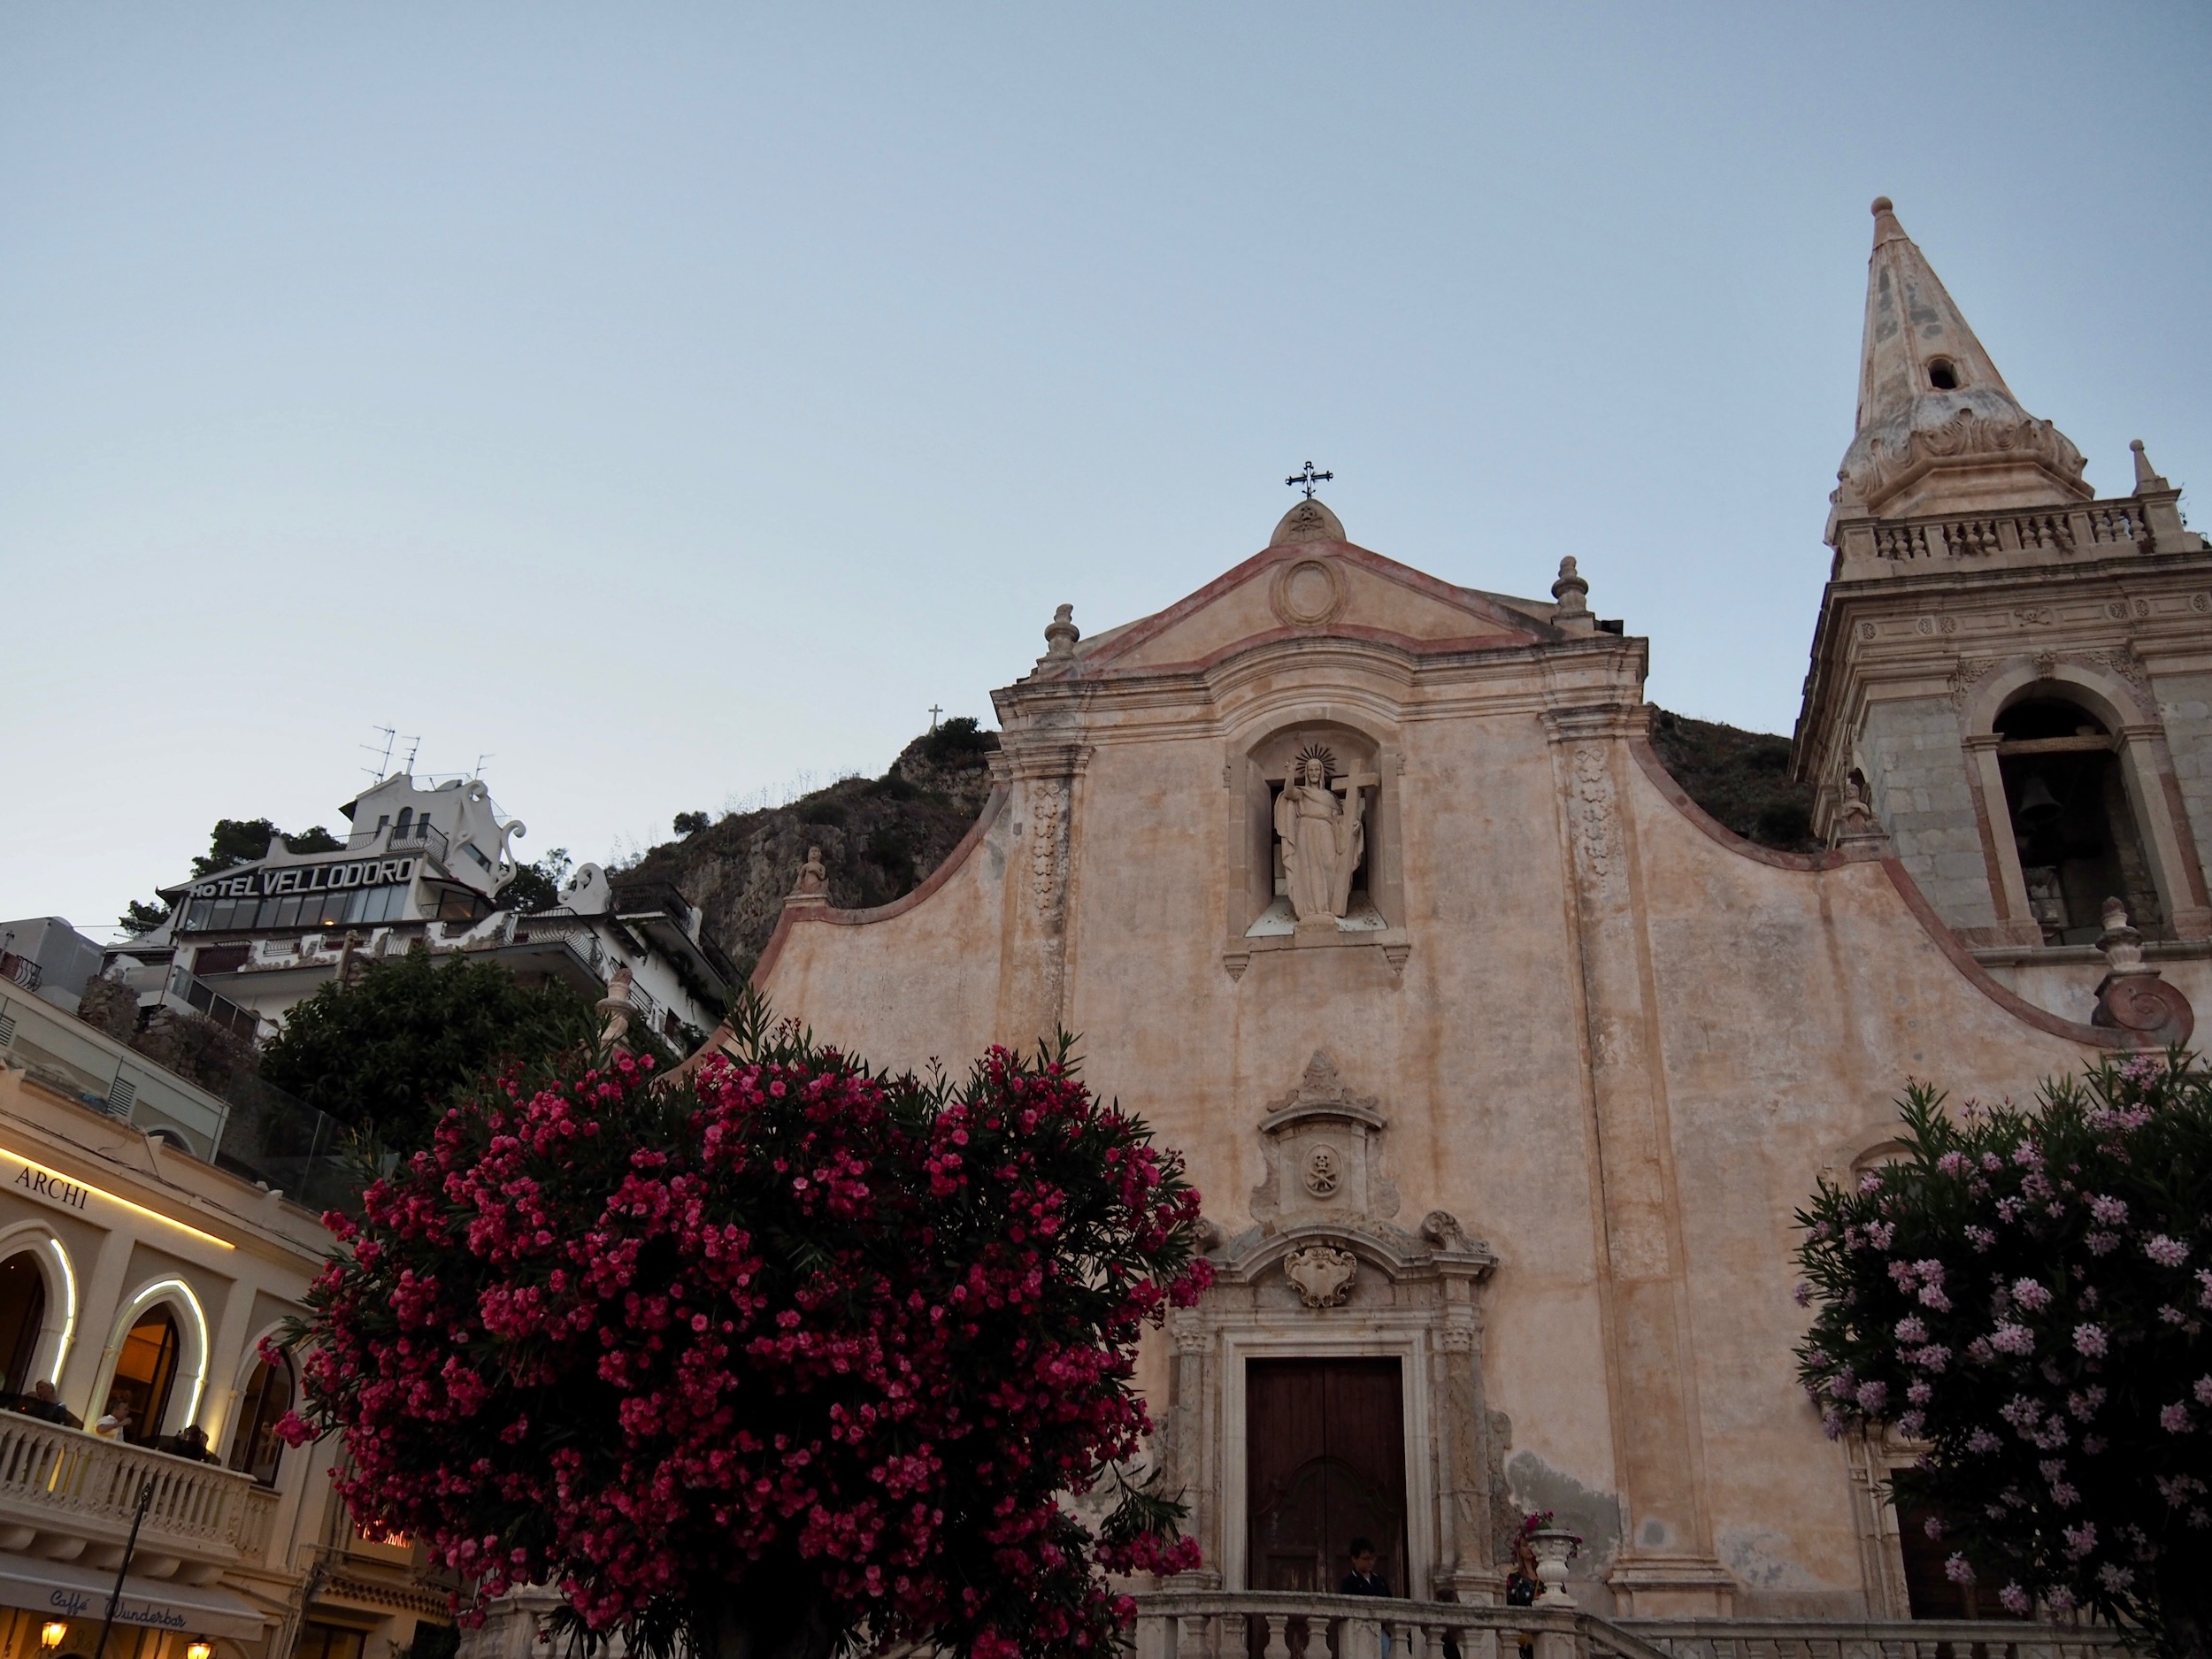 Chiesa Santa Caterina D'Alessandria